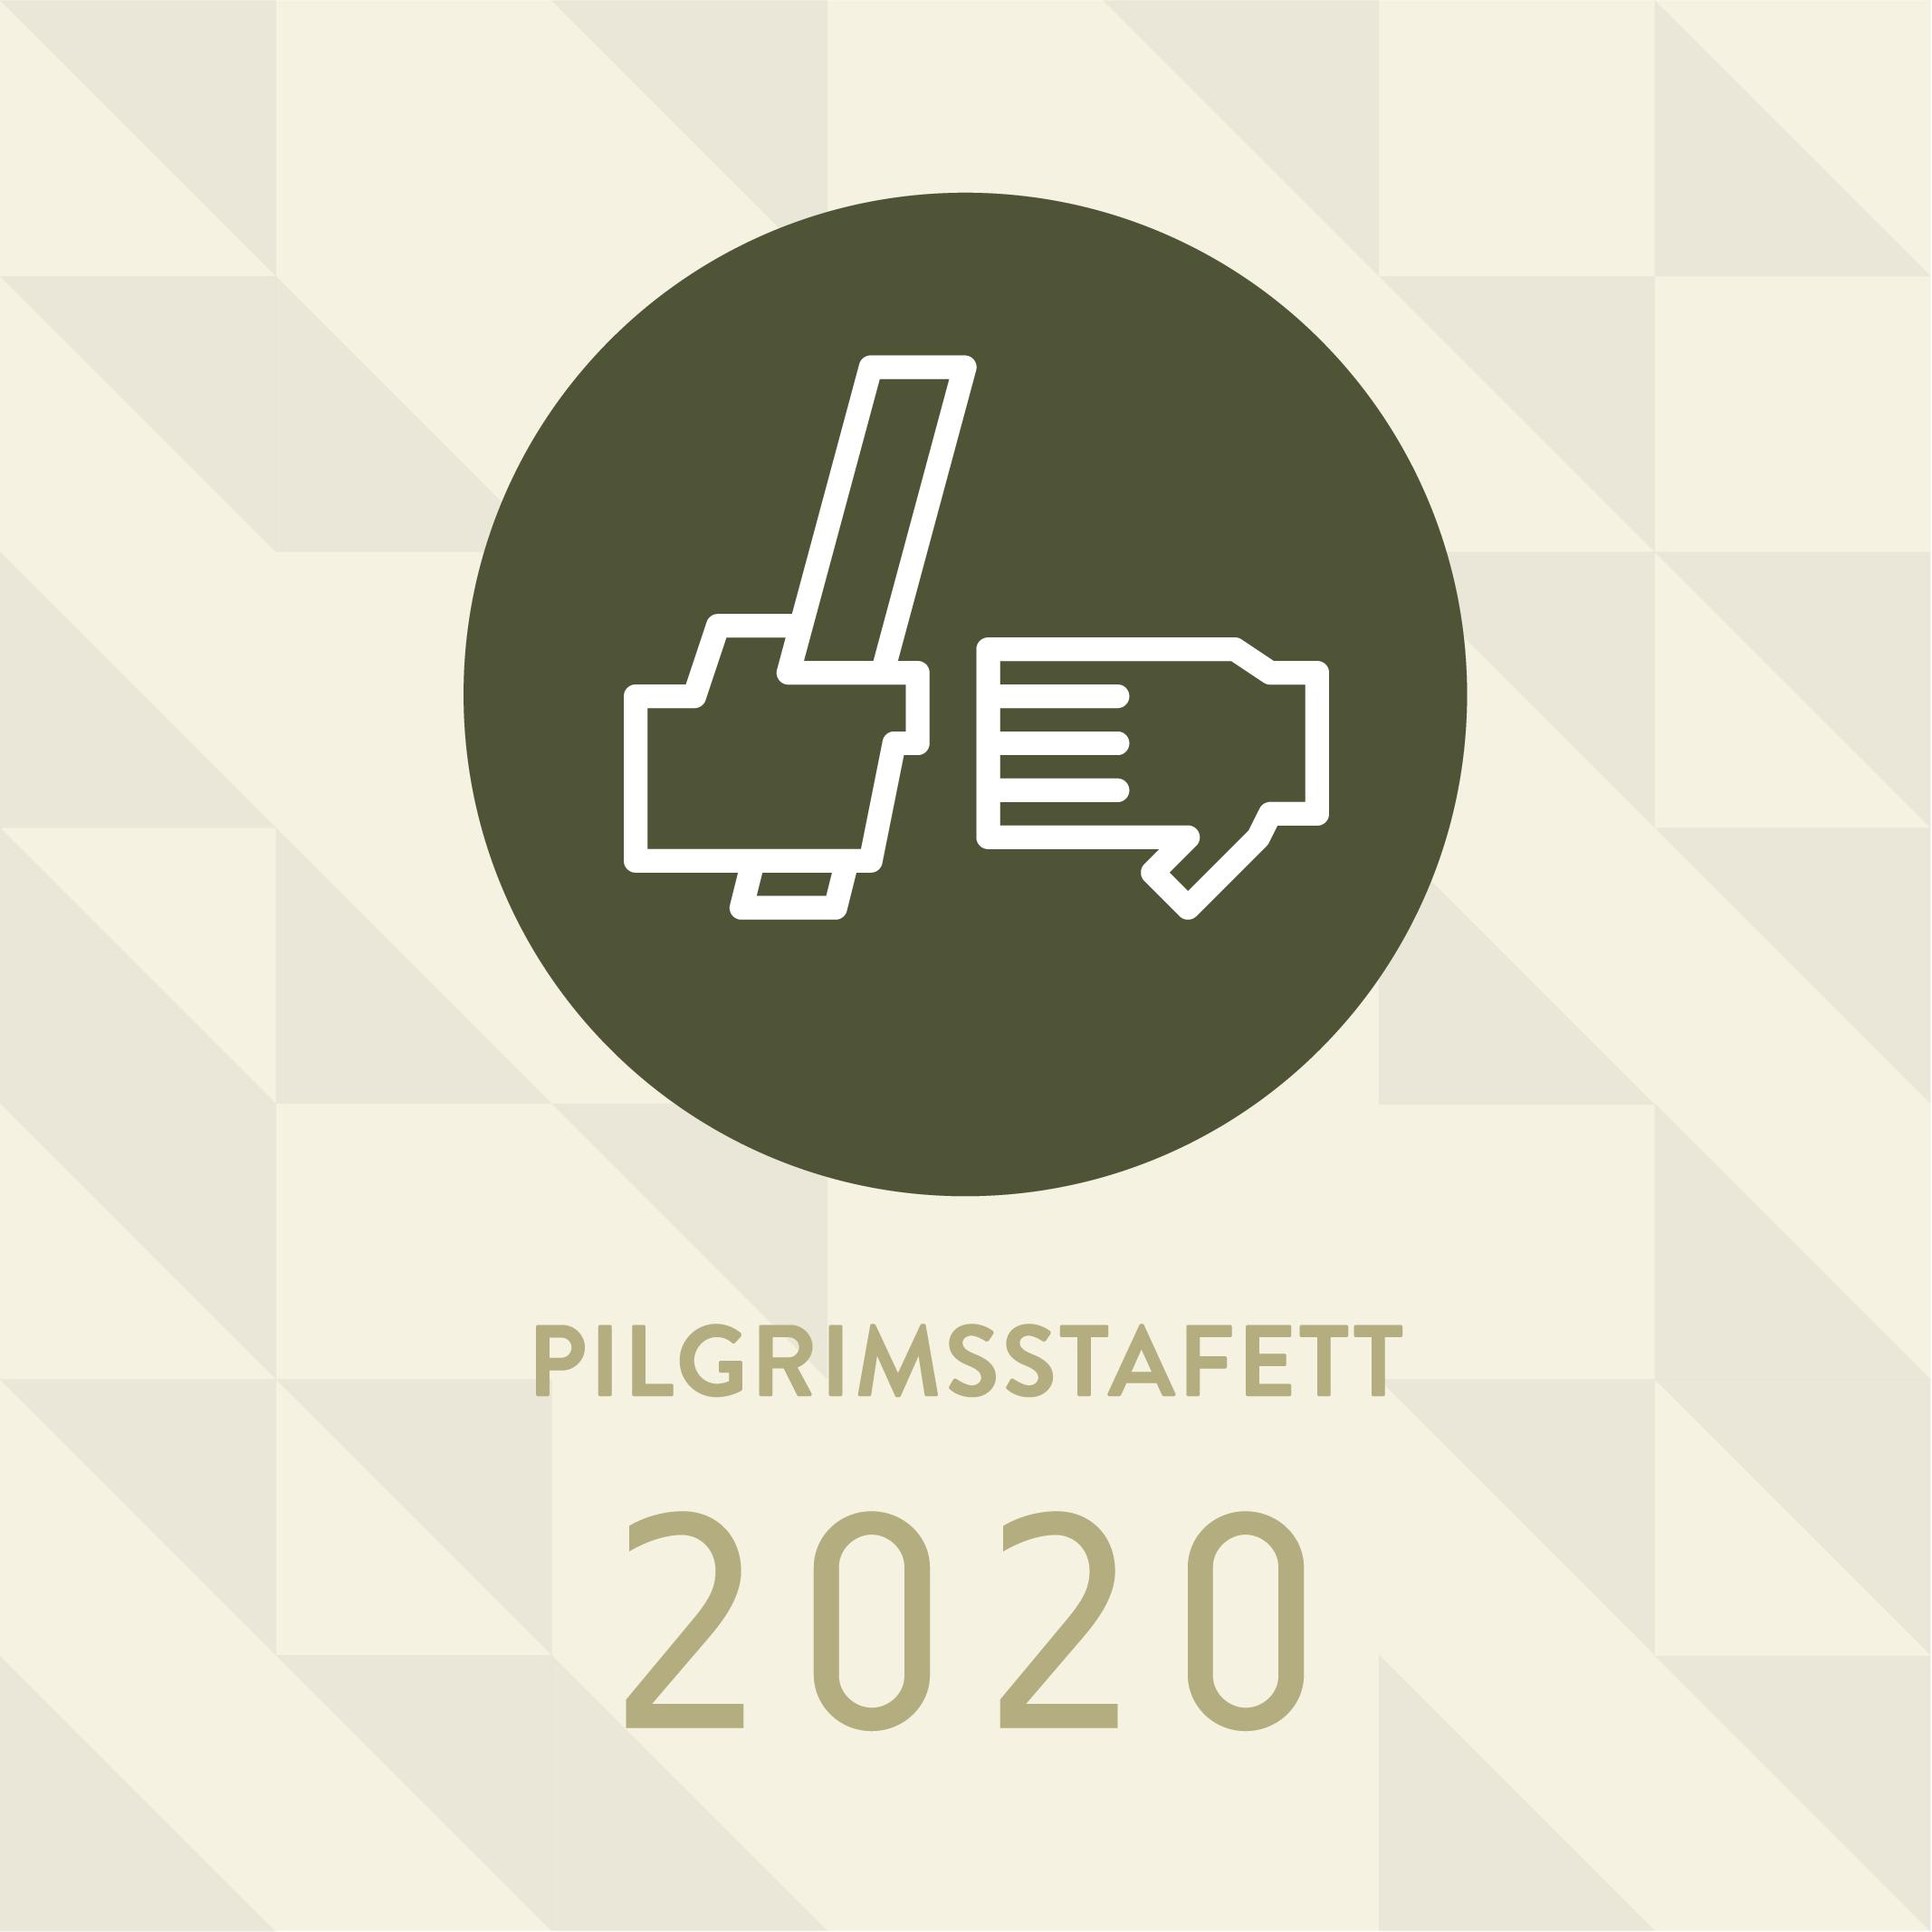 Case: Pilgrimsstafett längs S:t Olavsleden